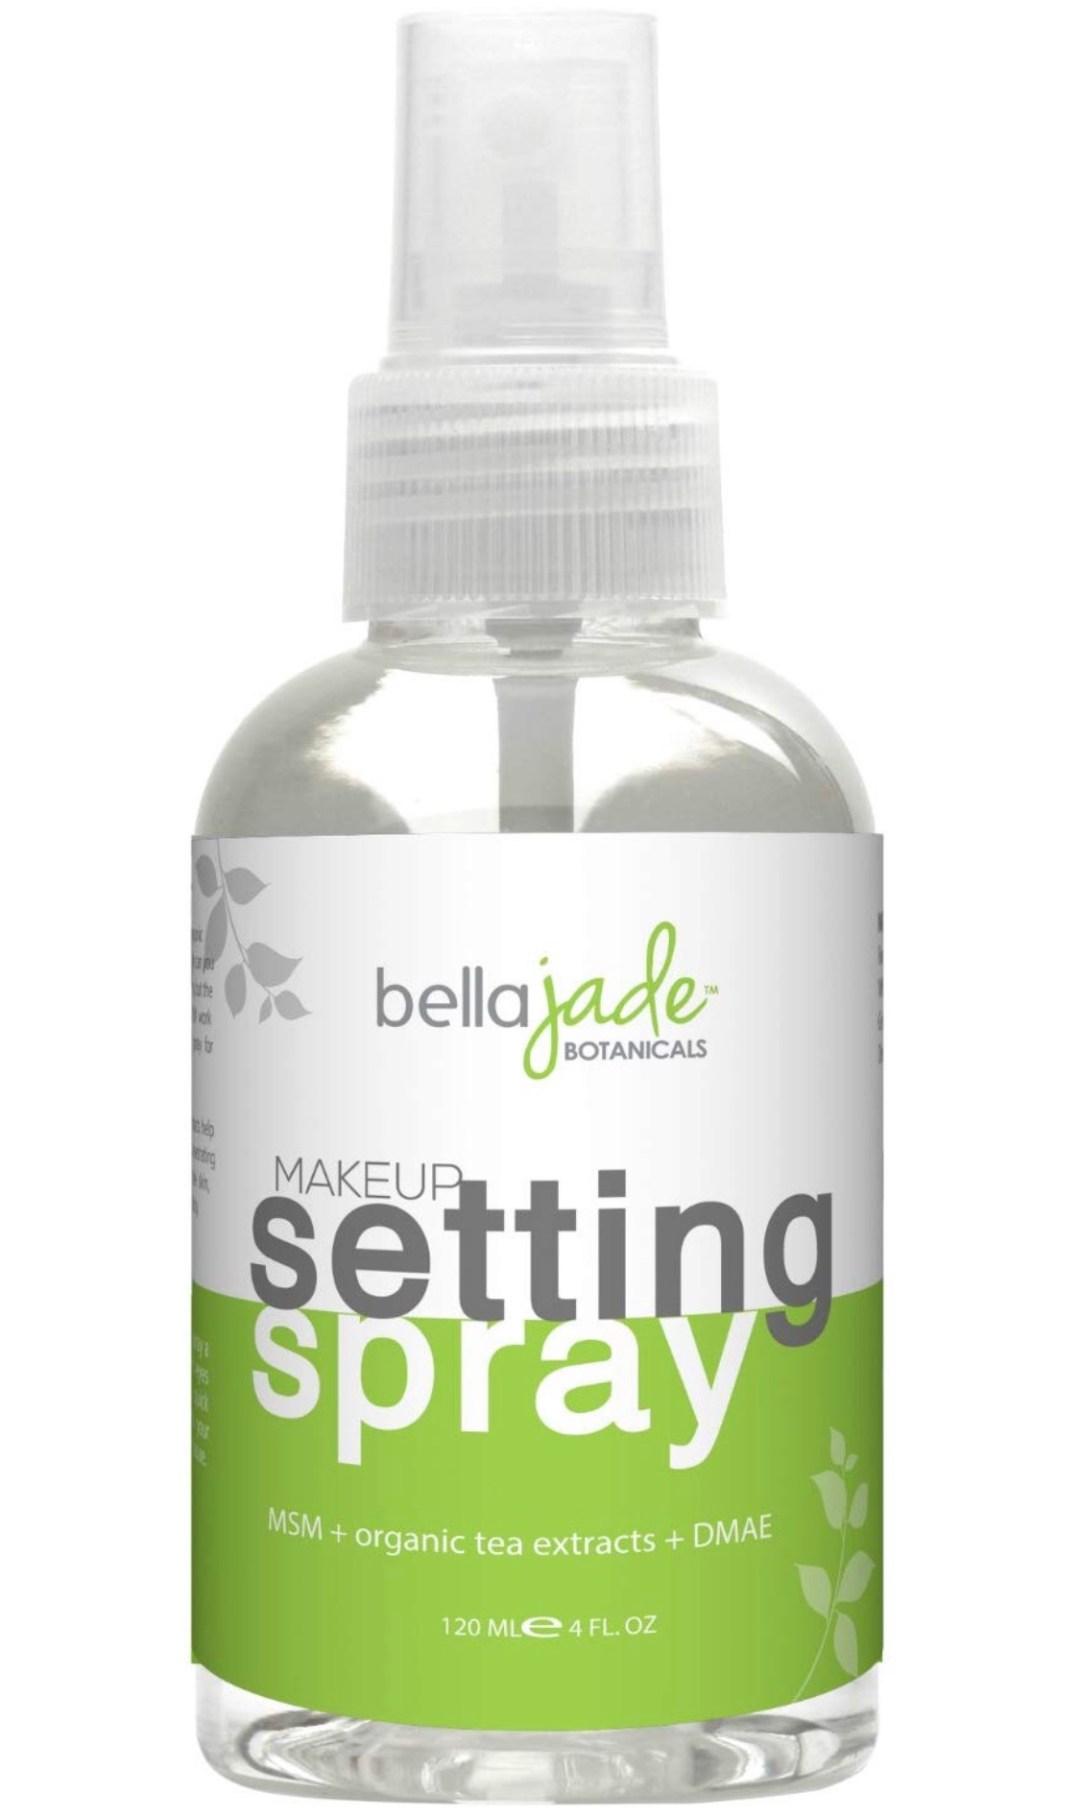 Make-up Setting Spray with Organic Green Tea